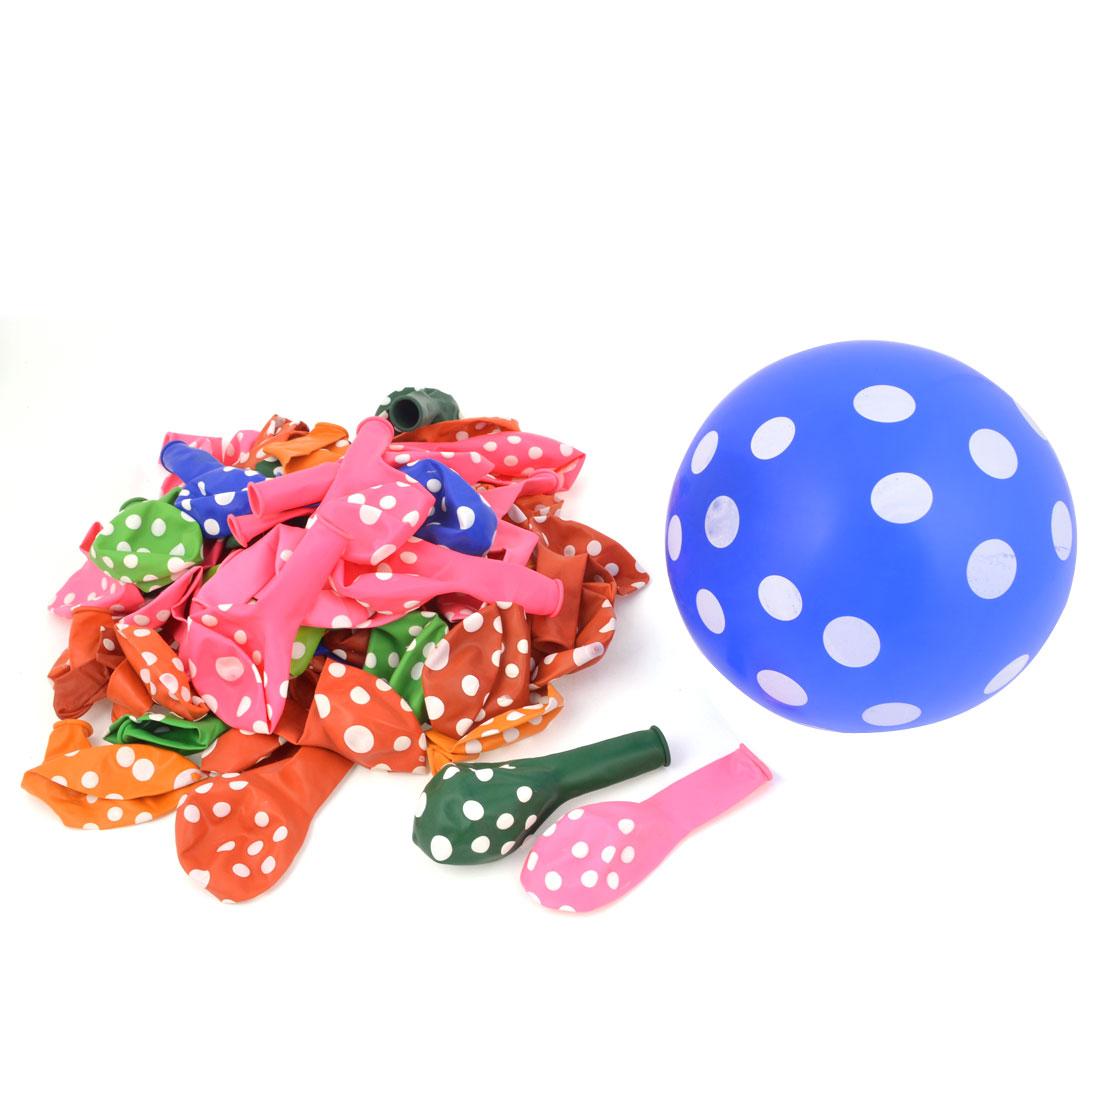 Assorted Color Dots Printed Festival Decorative Latex Balloons 100 Pcs